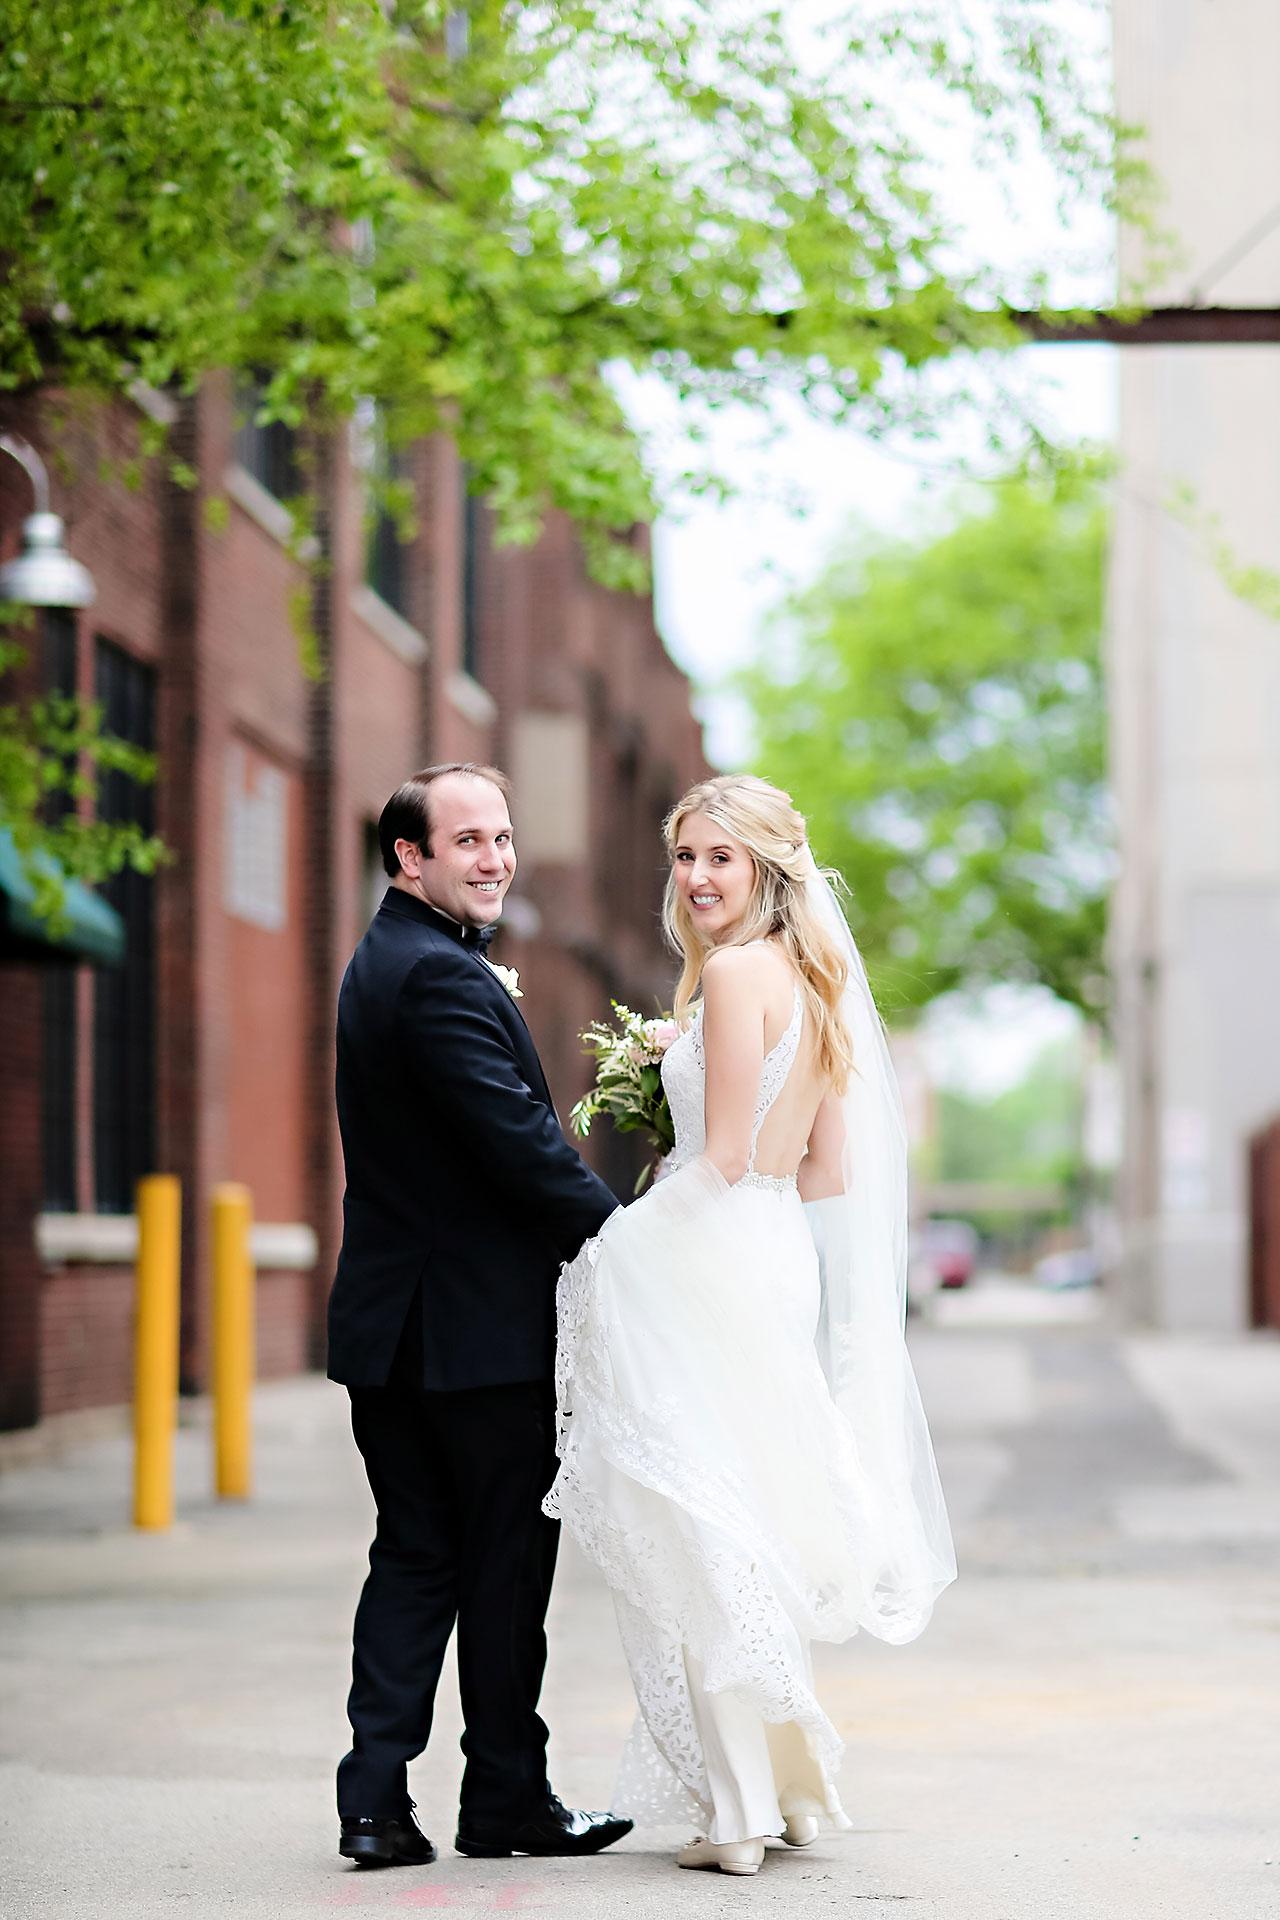 Allison Jeff Union Station Crowne Plaza Indianapolis wedding 147